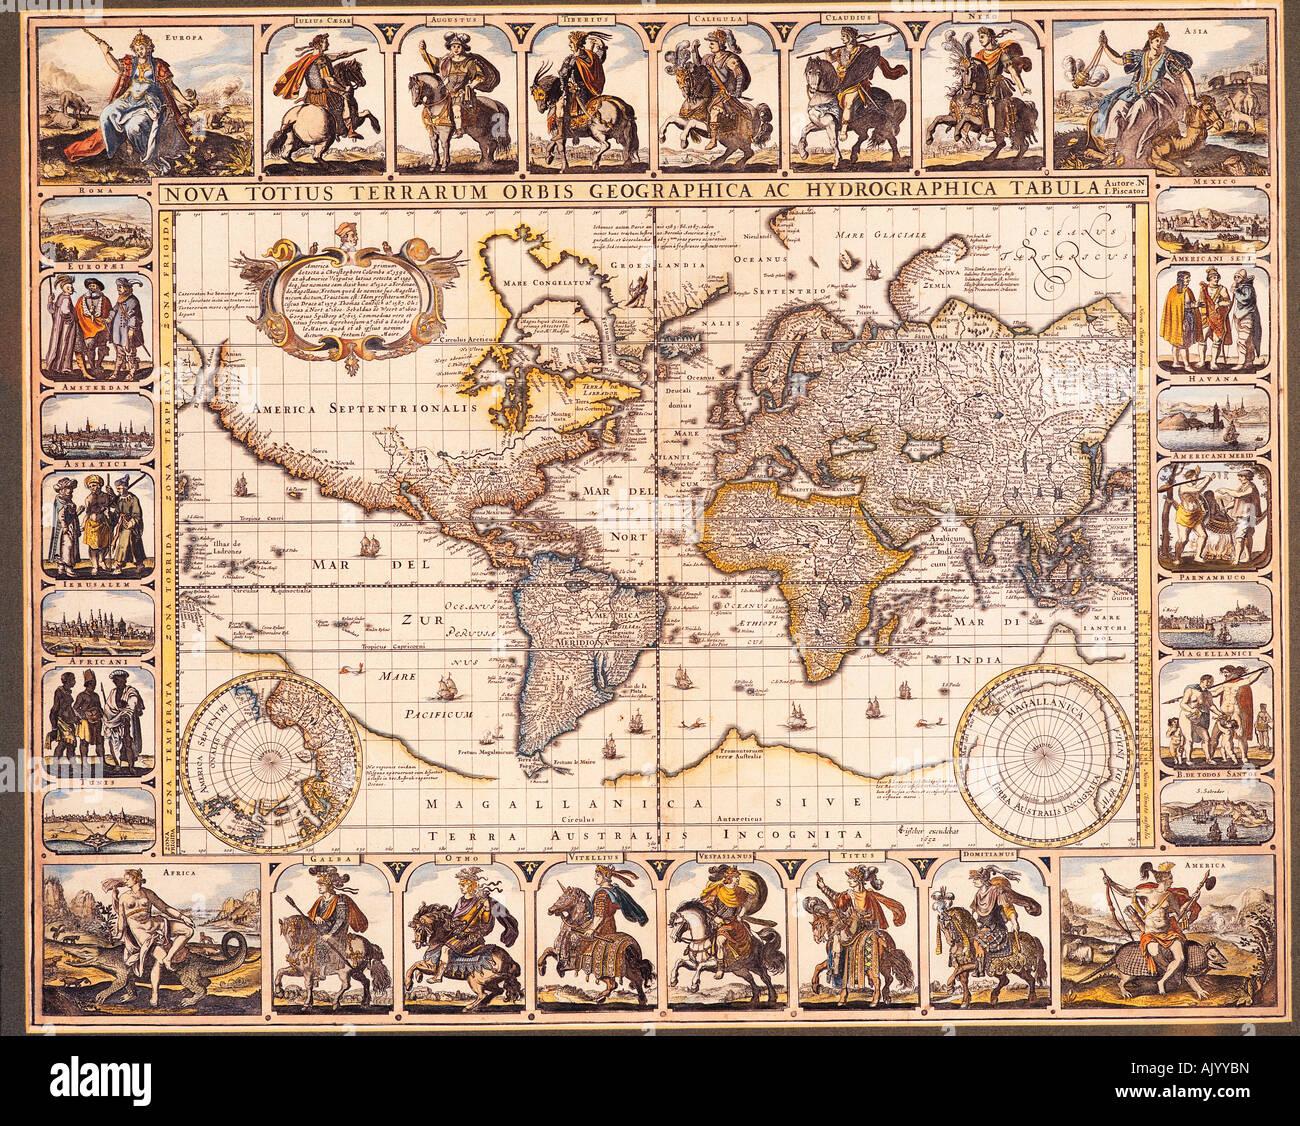 Historical map of the world. Nova totius Terrarum Orbis geographica ac hydrographica tabula by Hendrik Hondius, Stock Photo